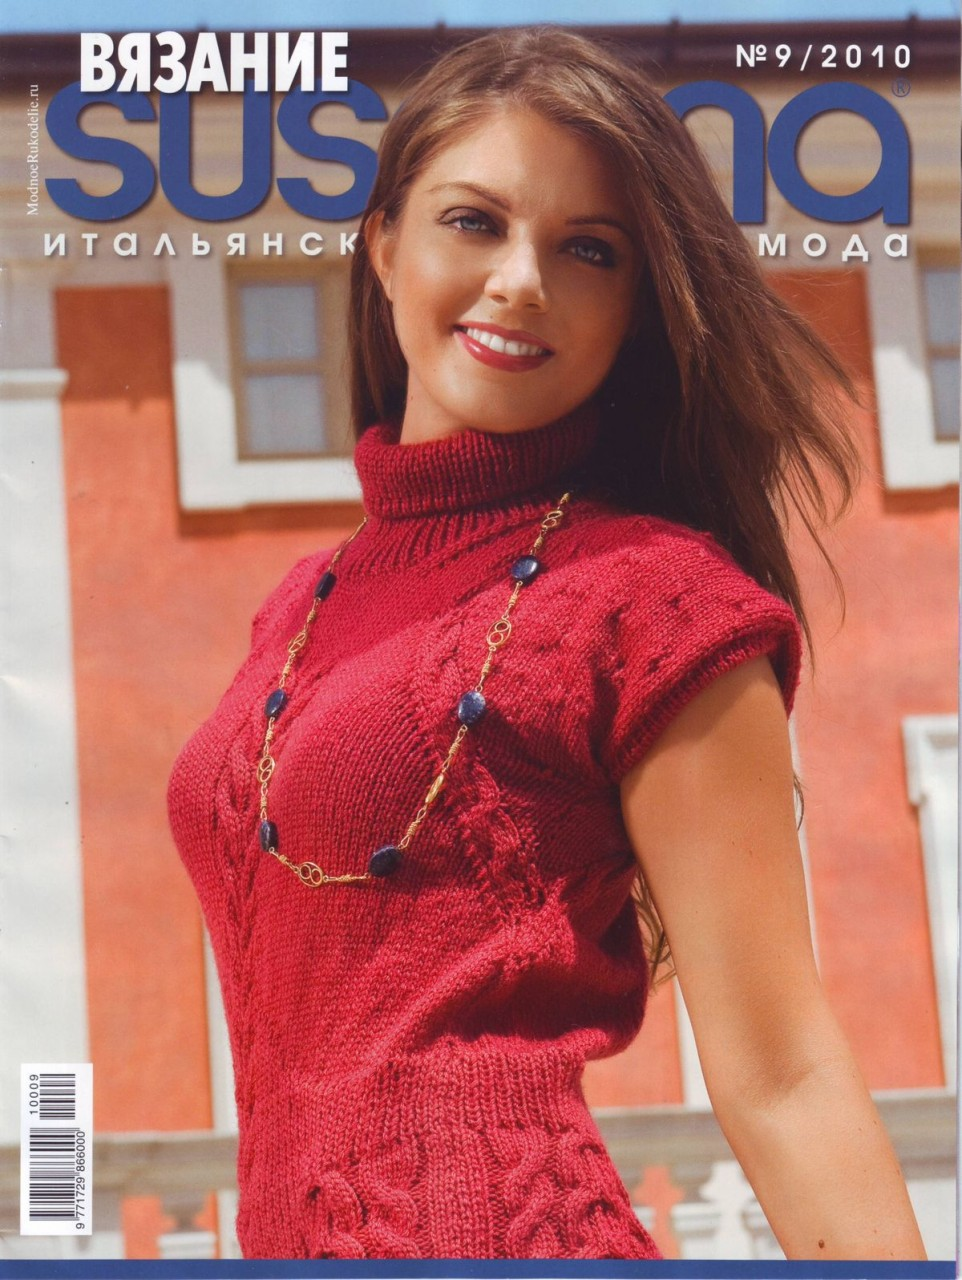 Susanna №2010-09